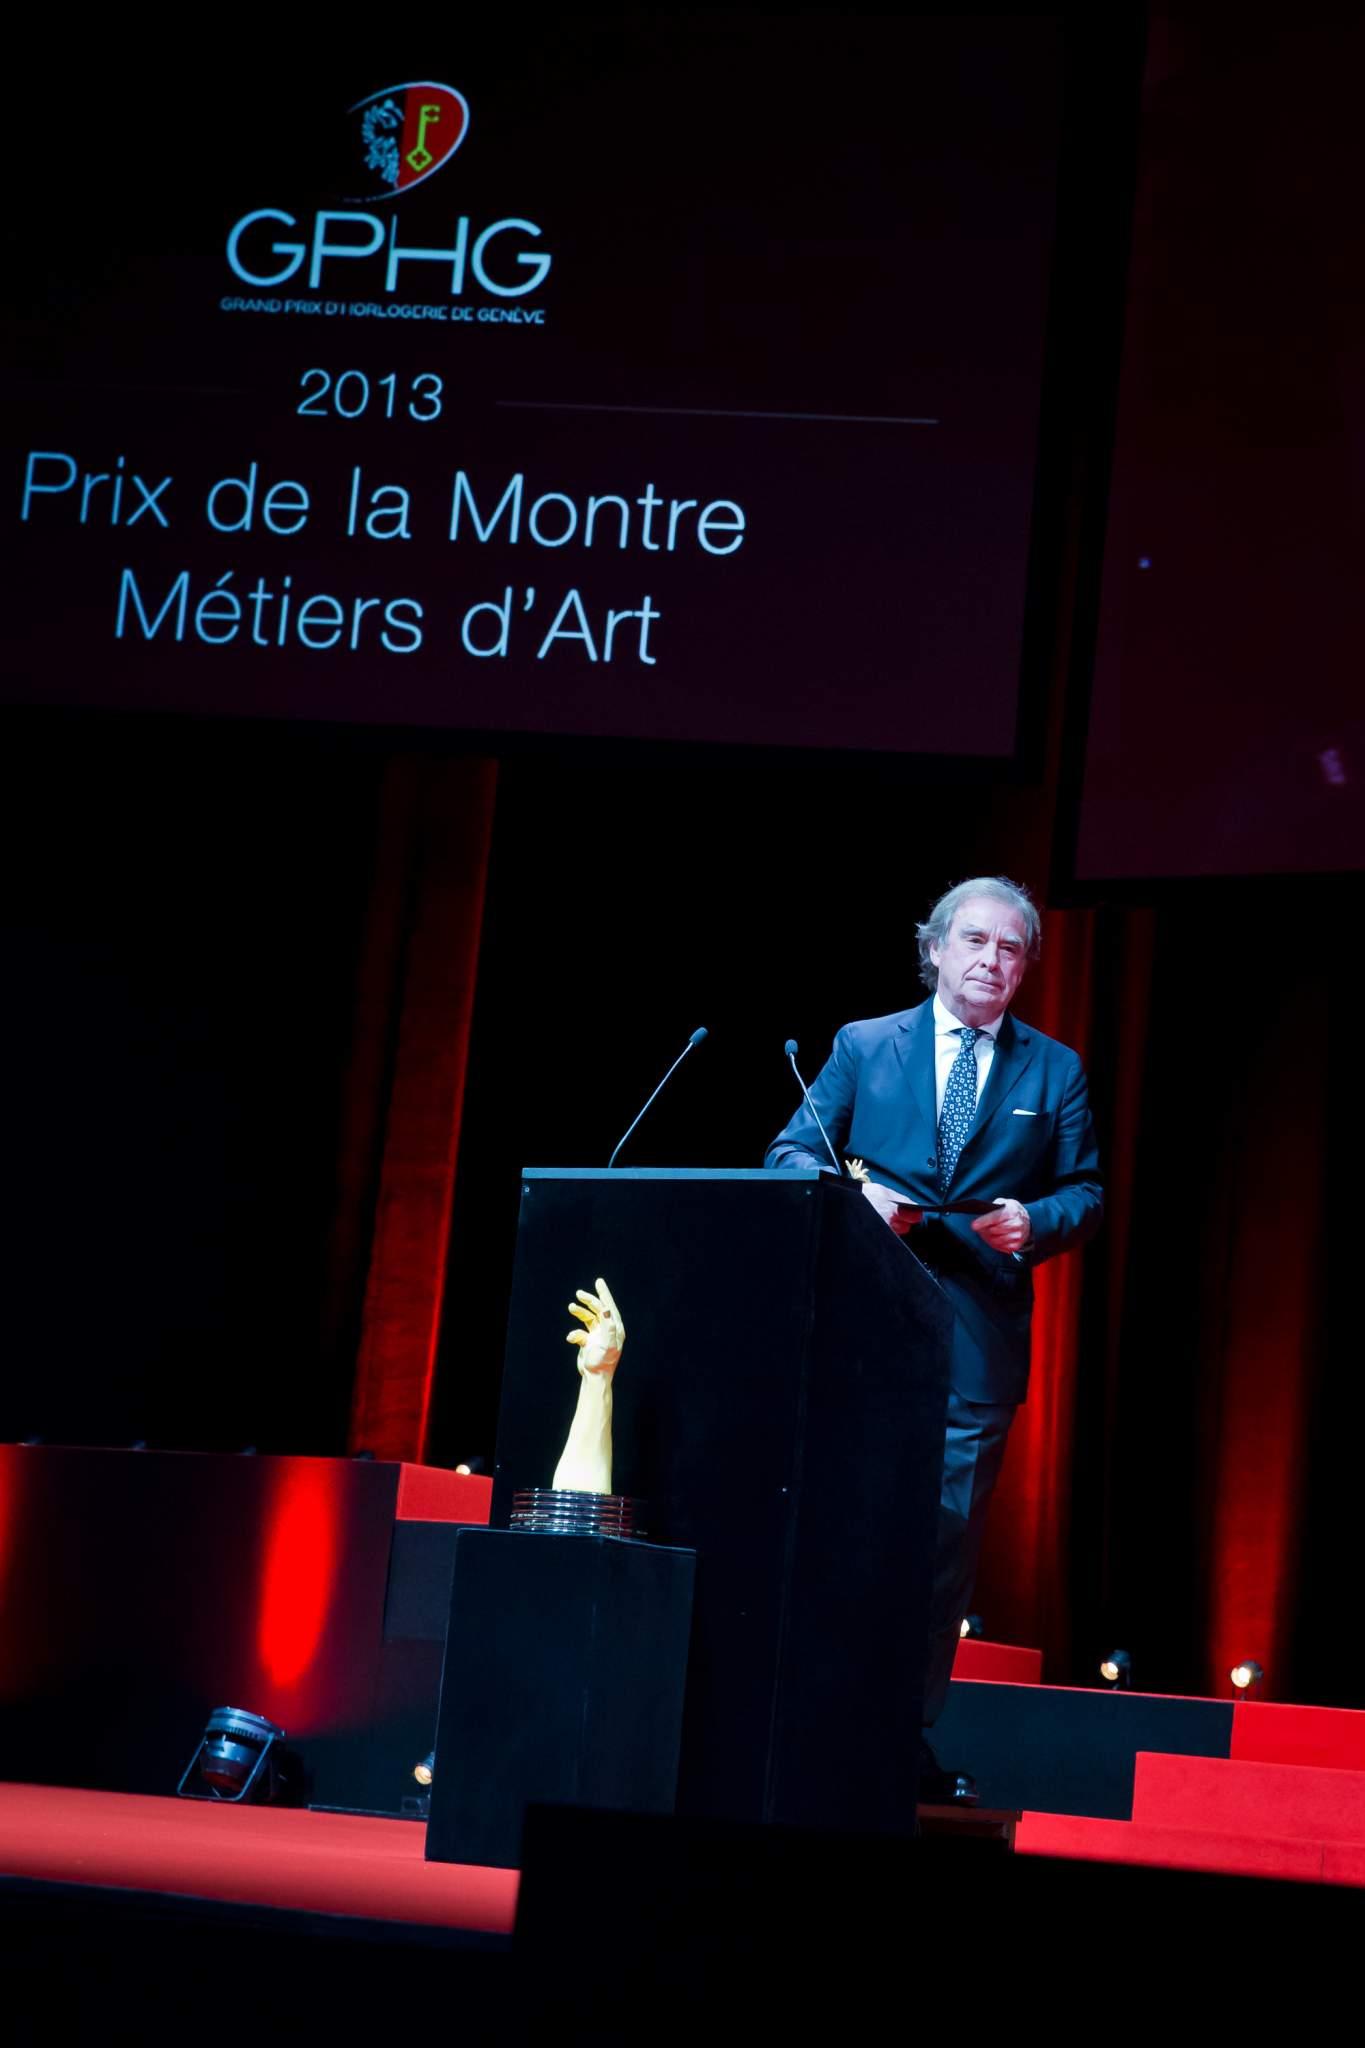 Jean-Michel Wilmotte, member of the Jury 2013